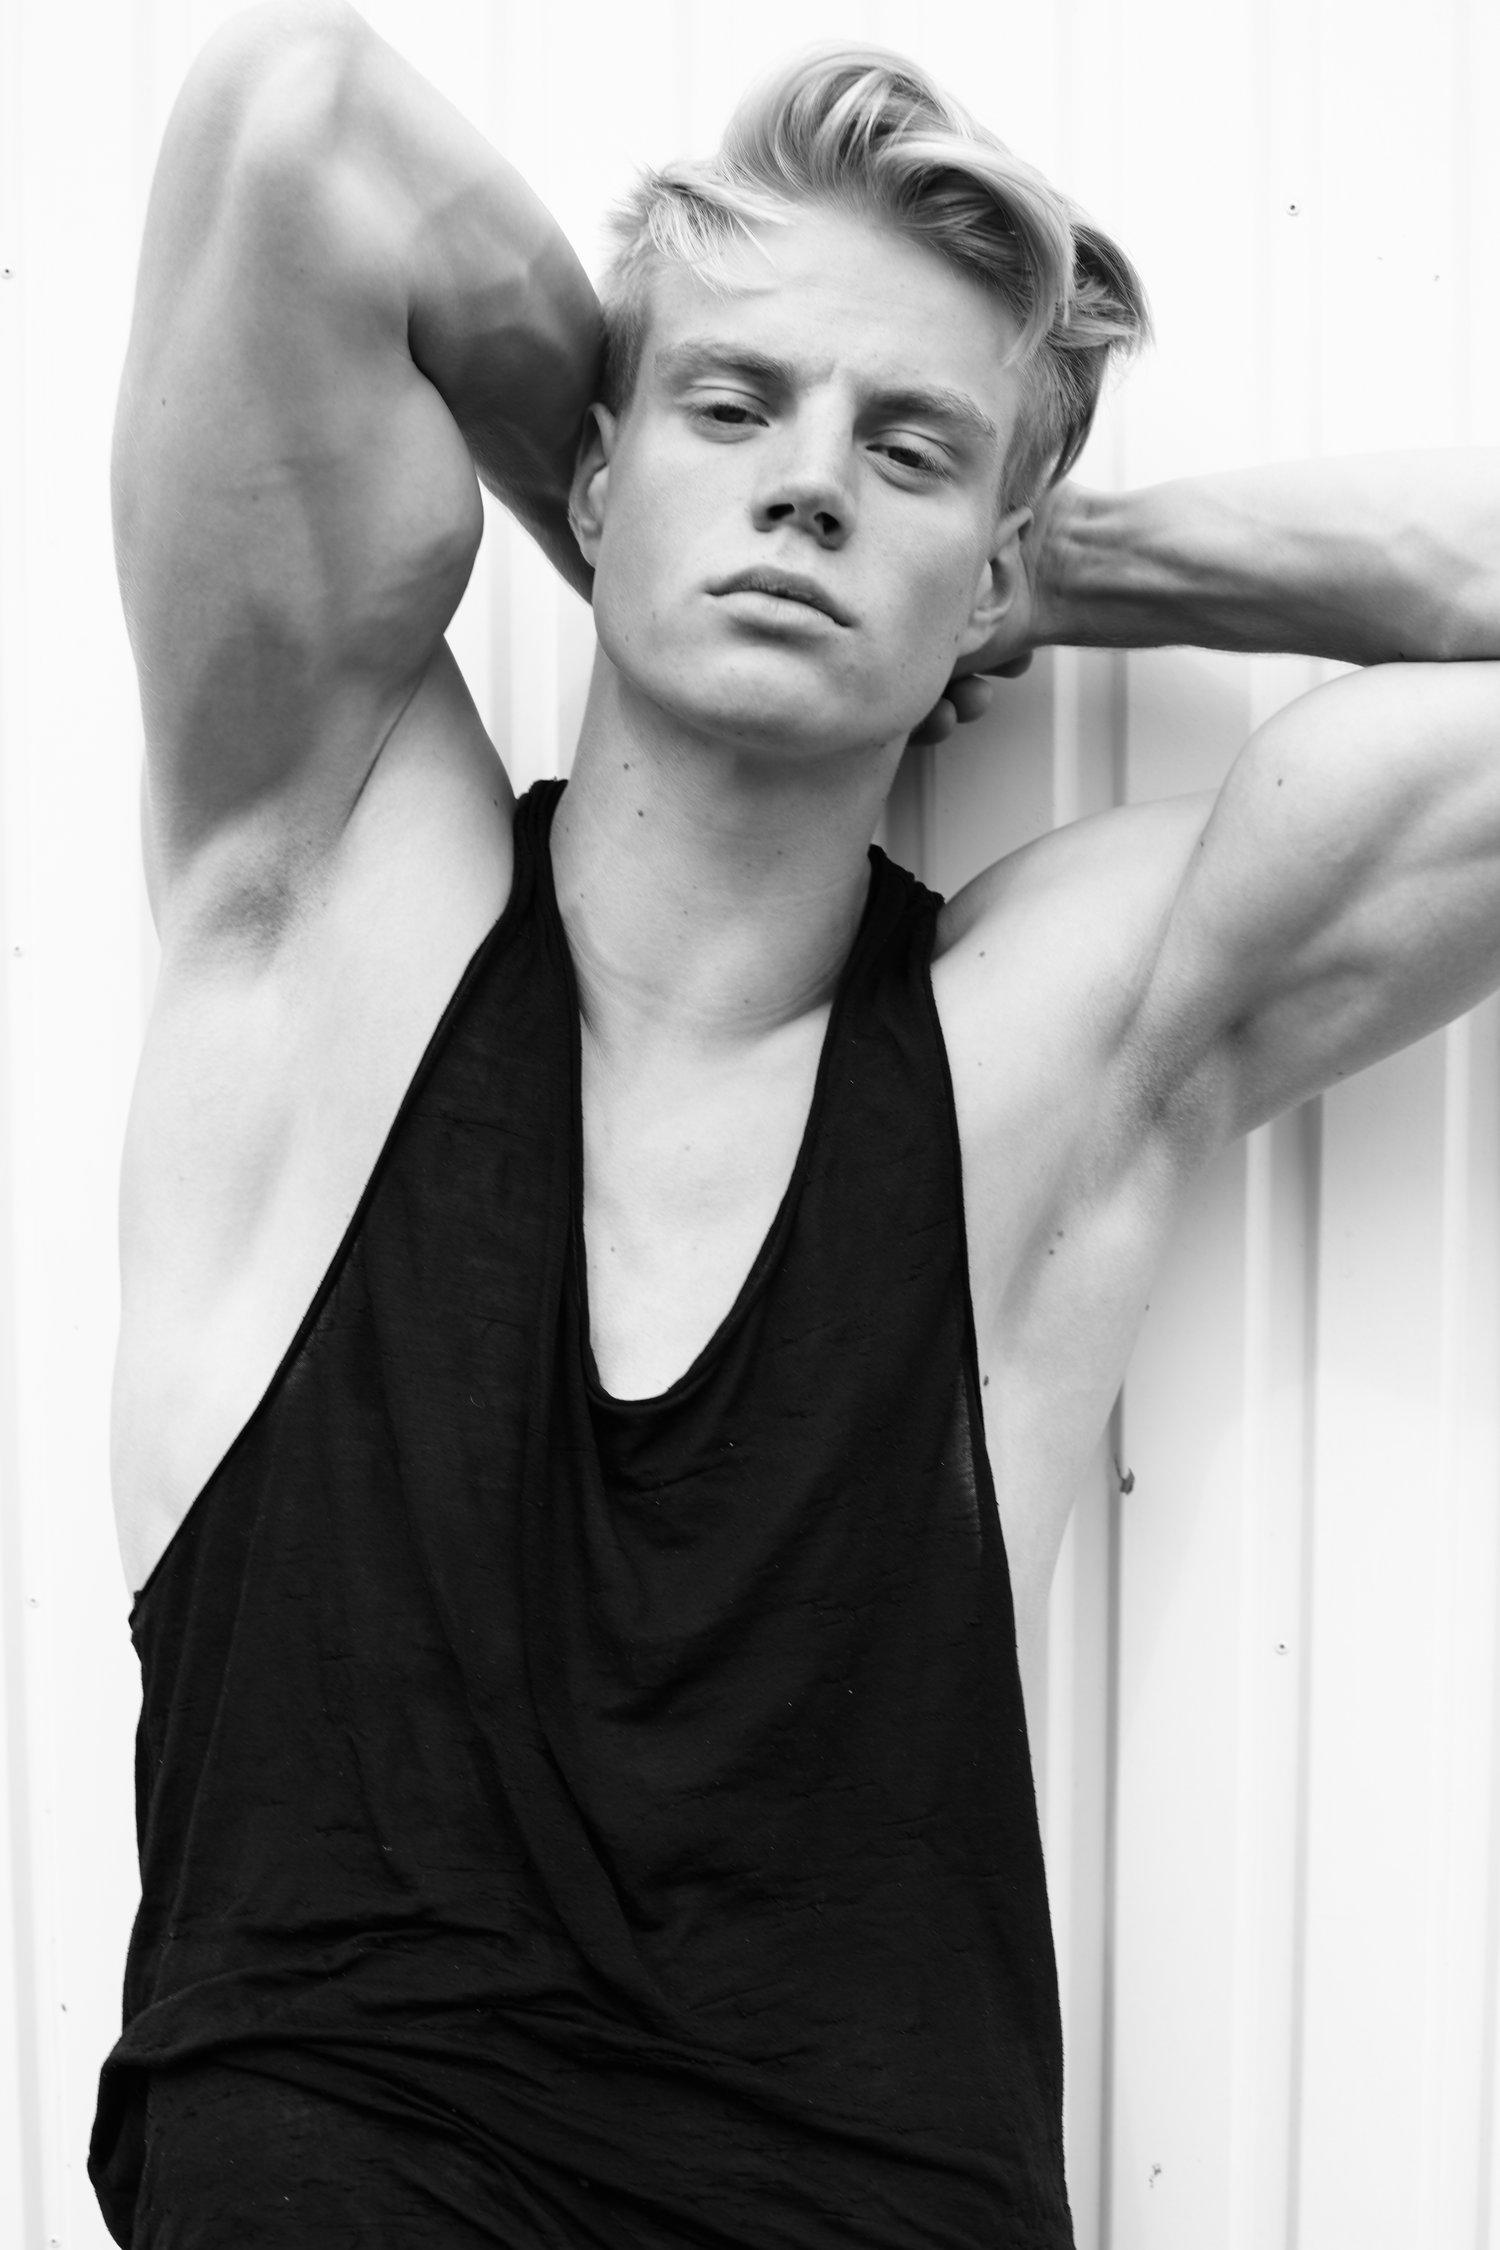 Adon Exclusive: Model Lennart Mugler By Jonas Huckstorf